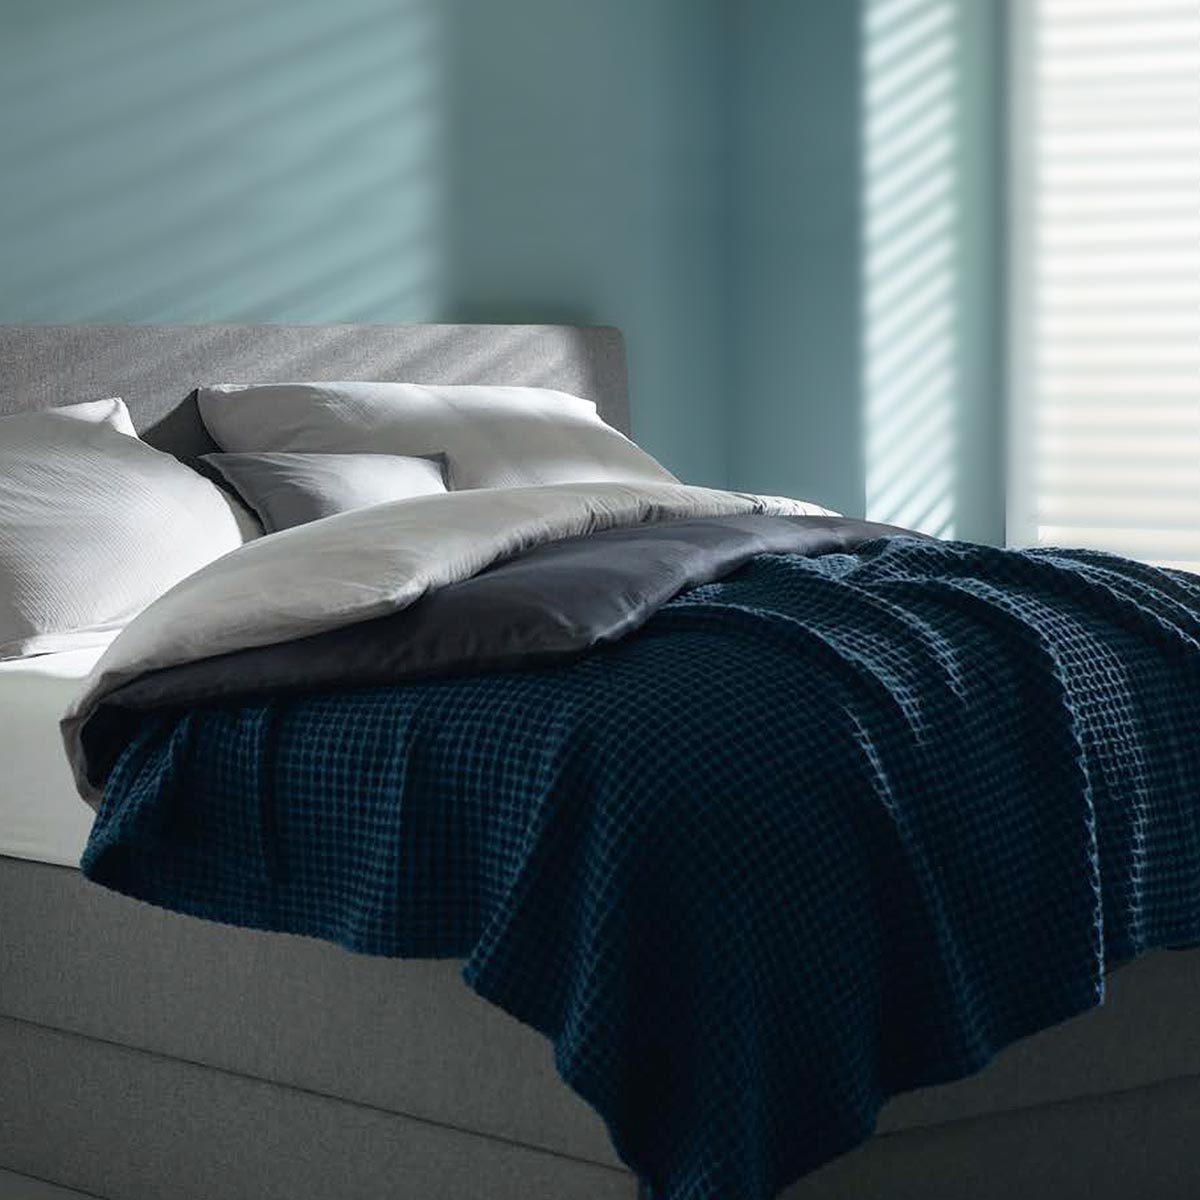 Schlafgut Casual Cotton Uni Tagesdecke 9850 Waffeloptik